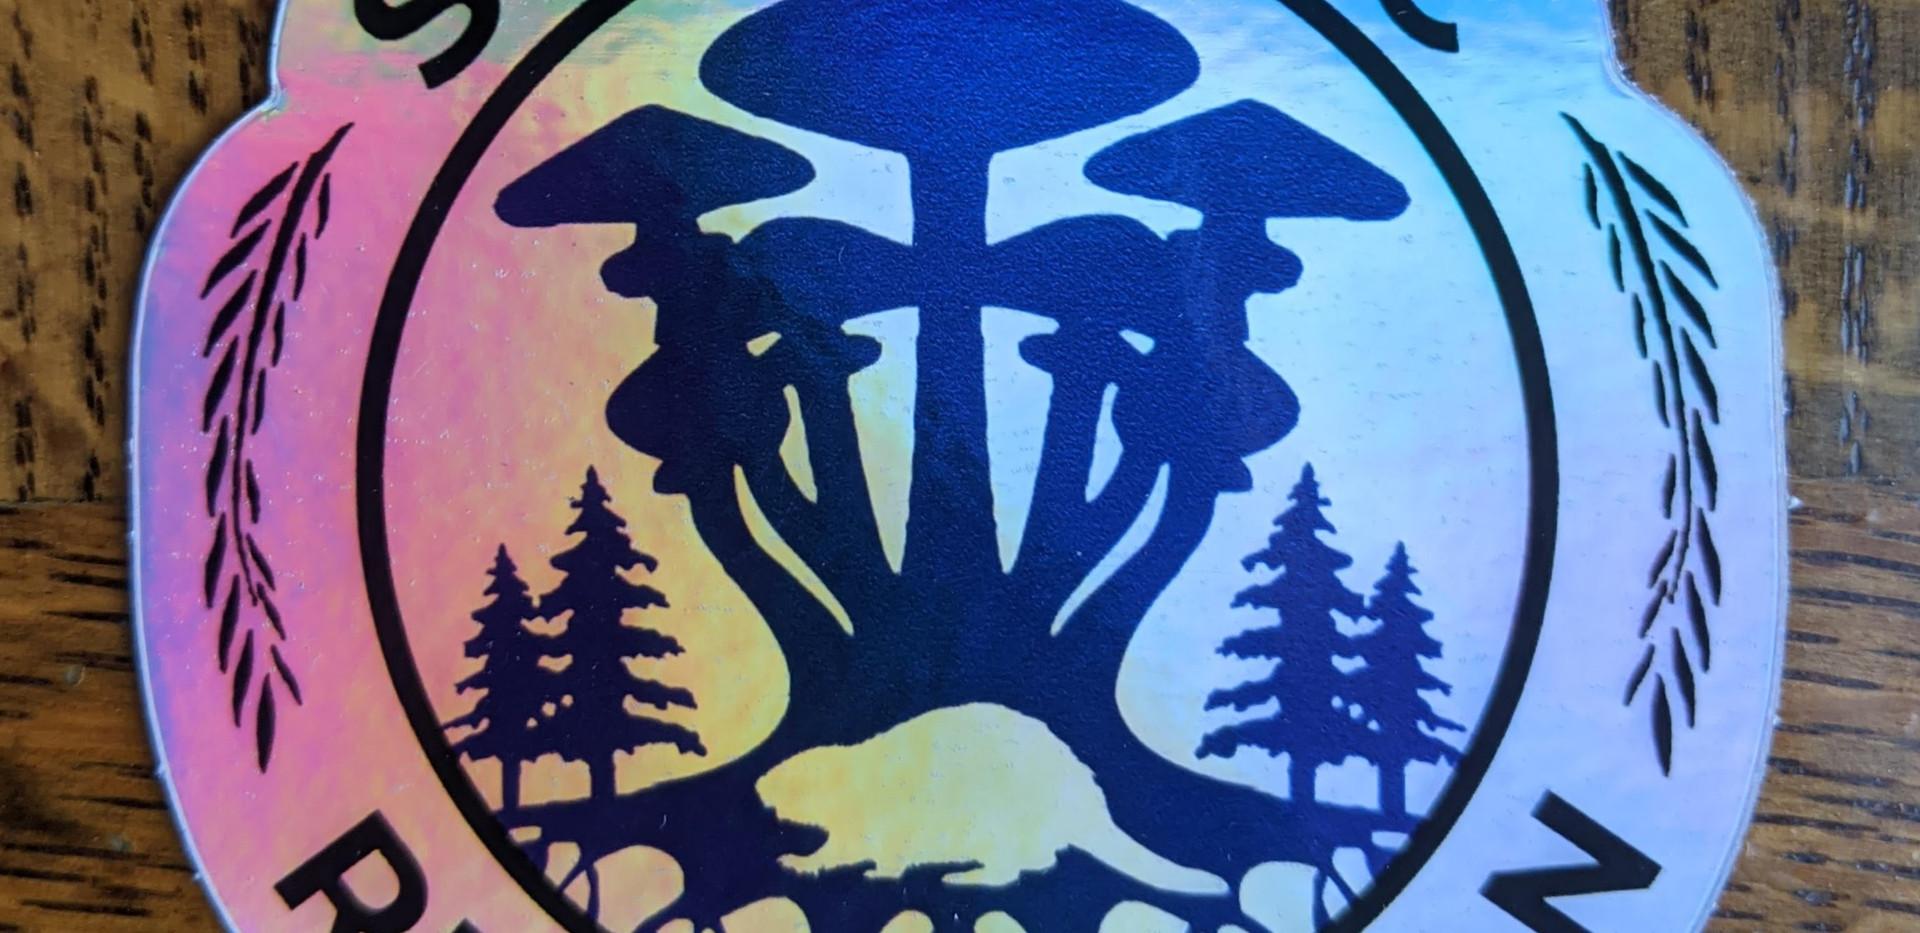 Holographic Mushroom Beaver 3x3